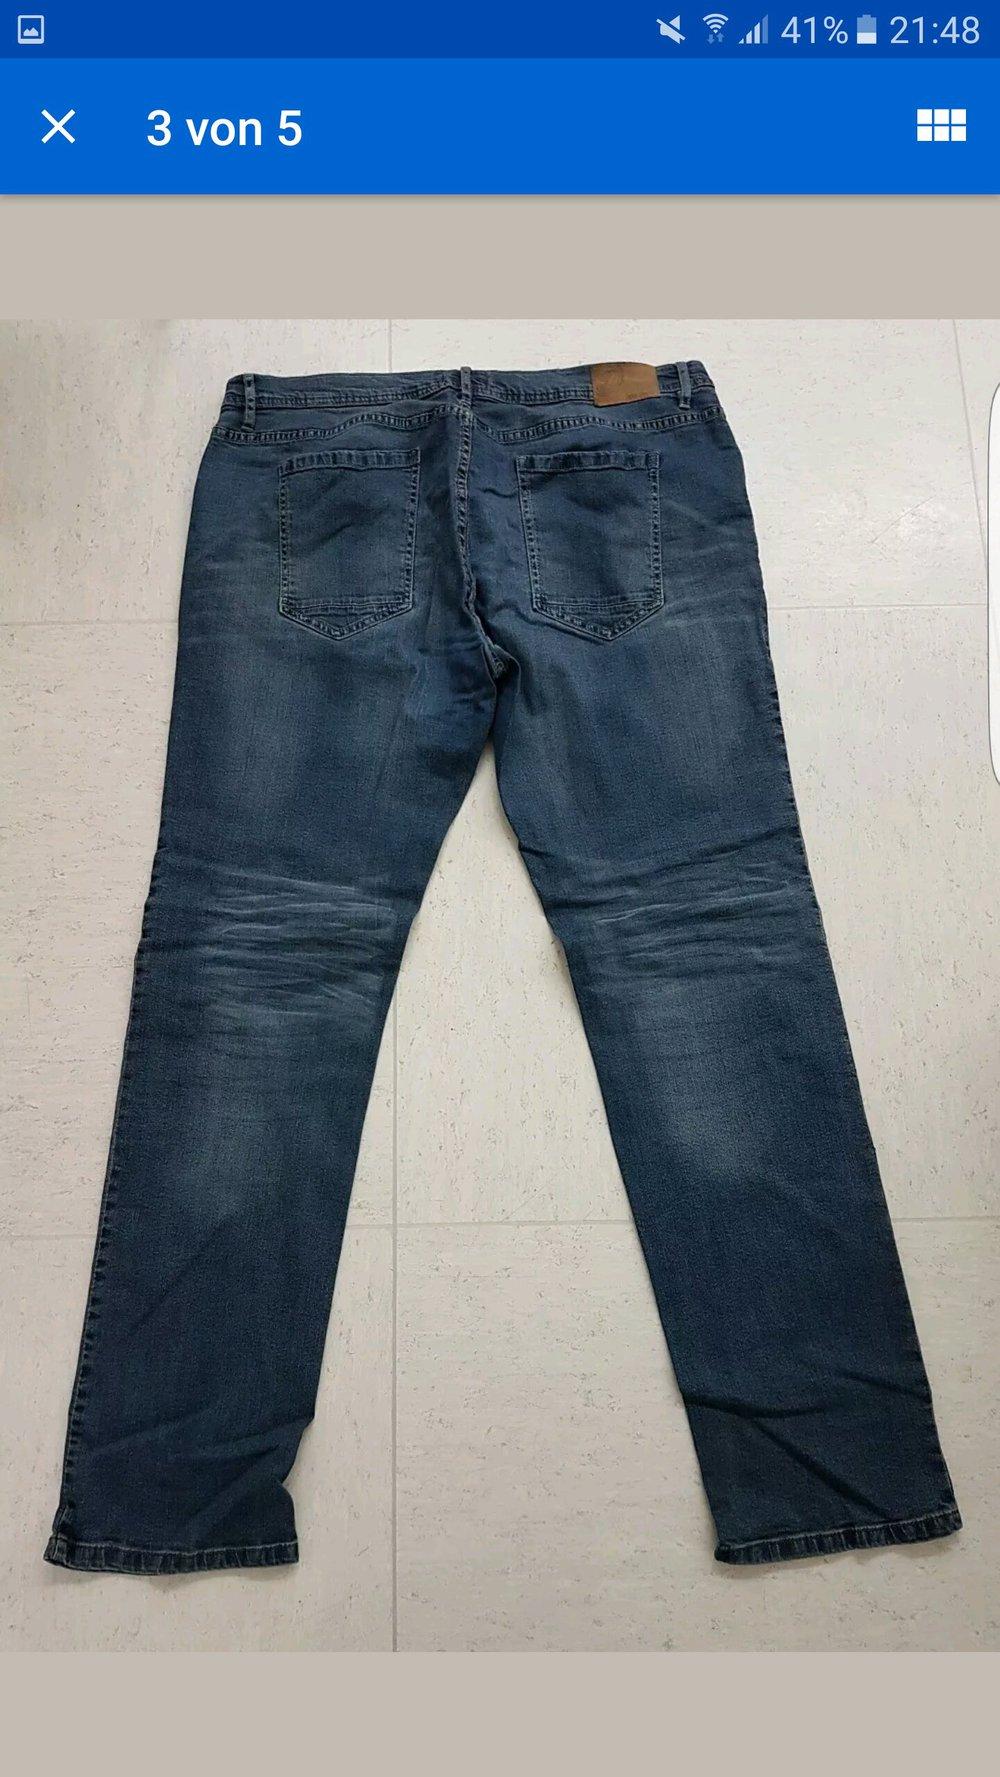 John Devin Marken Damen Jeans Hose 40 36    Kleiderkorb.at 8c4bc05a0e